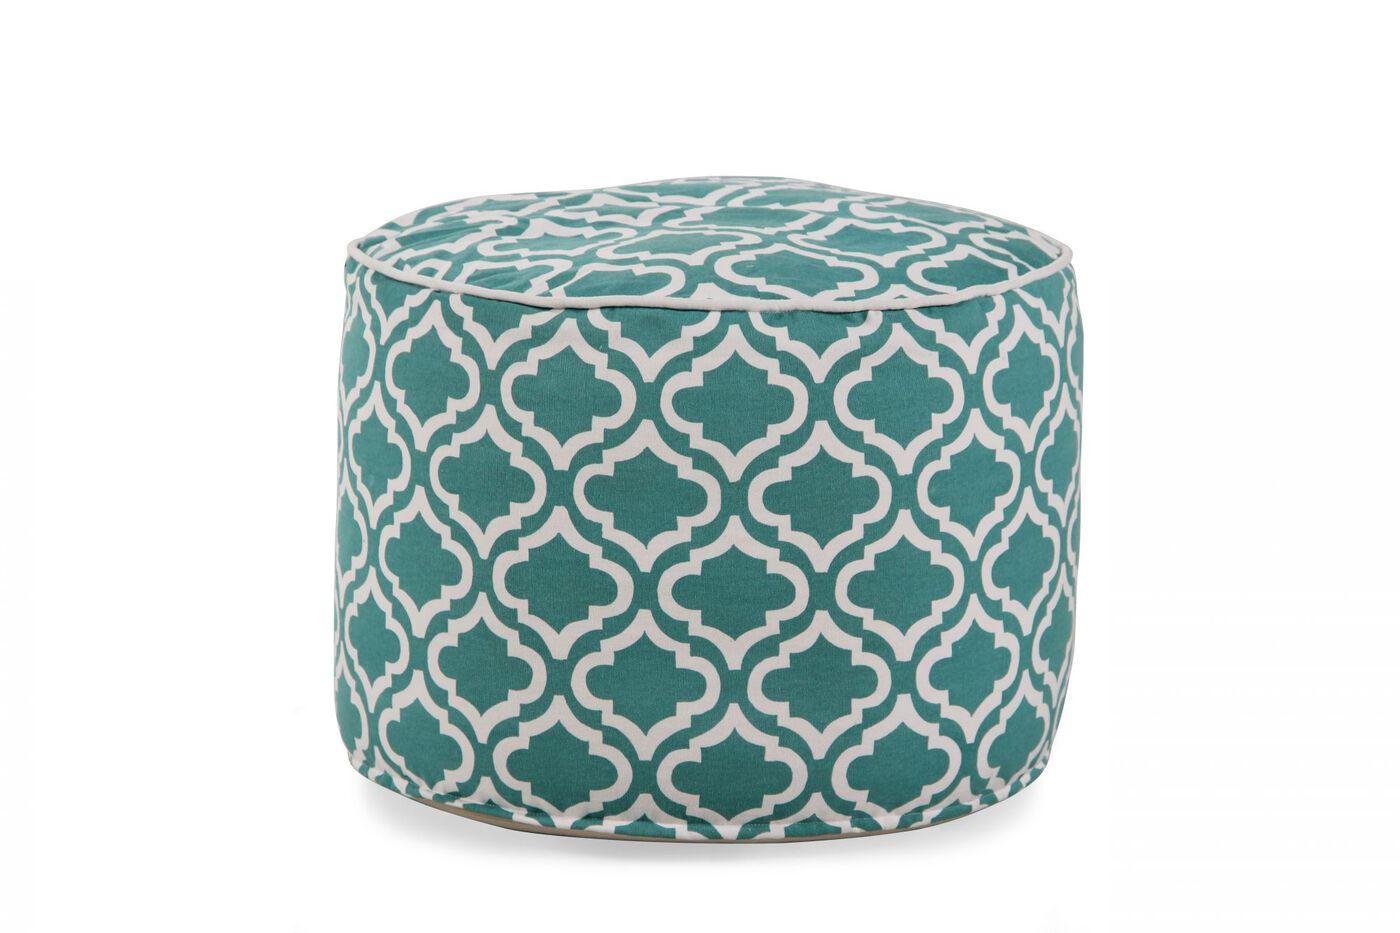 Ashley Geometric Turquoise Pouf | Mathis Brothers Furniture